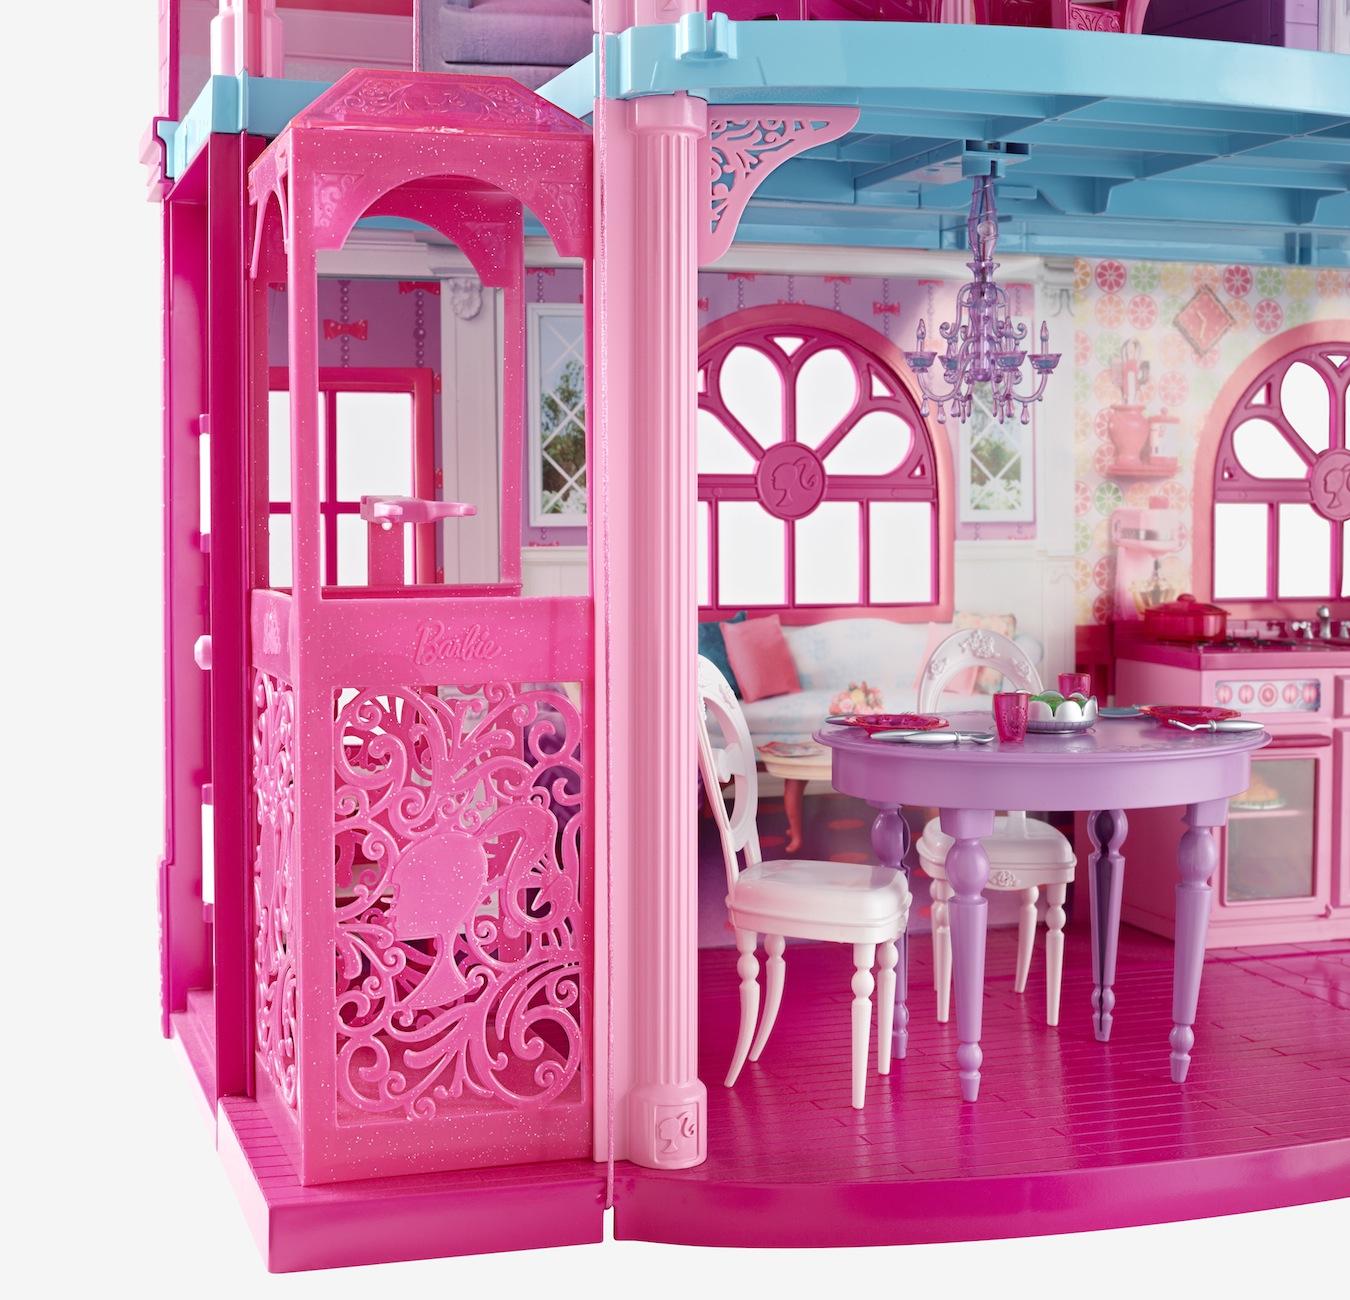 Barbie Lists Her Iconic Malibu Dreamhouse For $25 Million